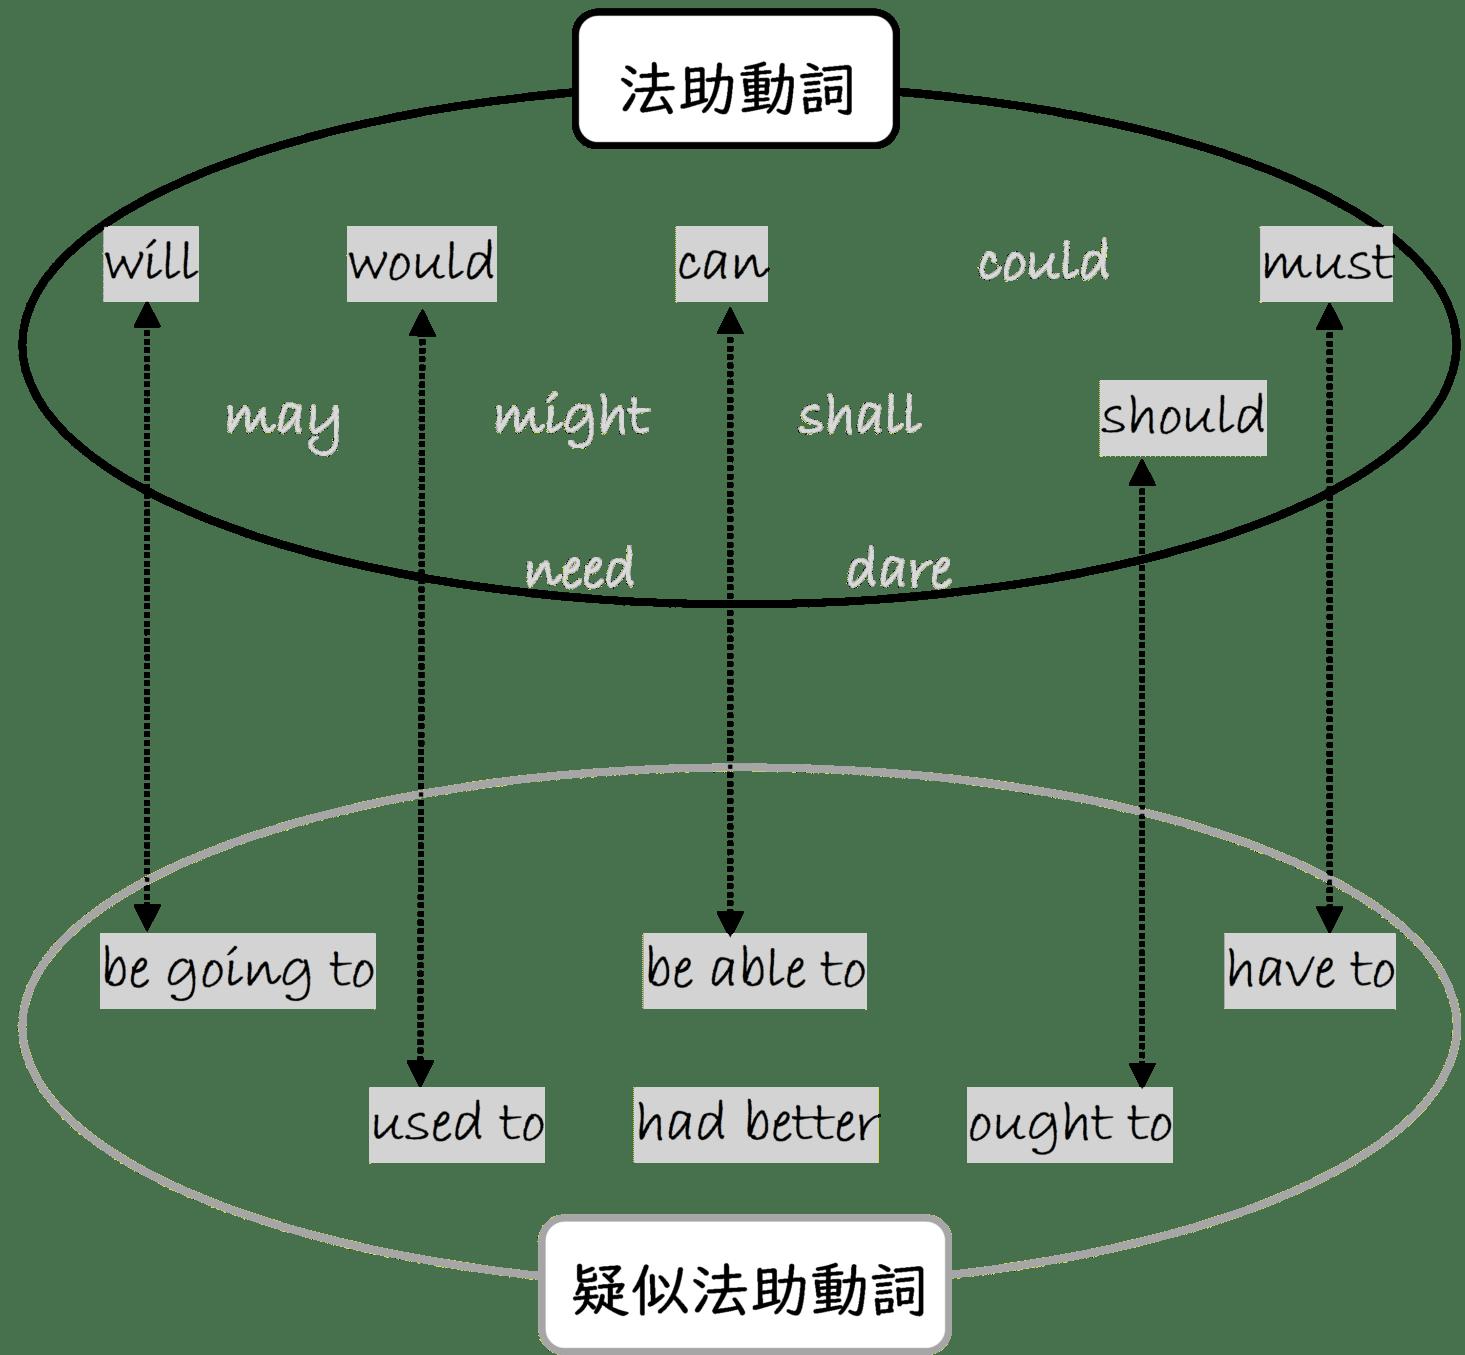 相助動詞と疑似法助動詞の関連性